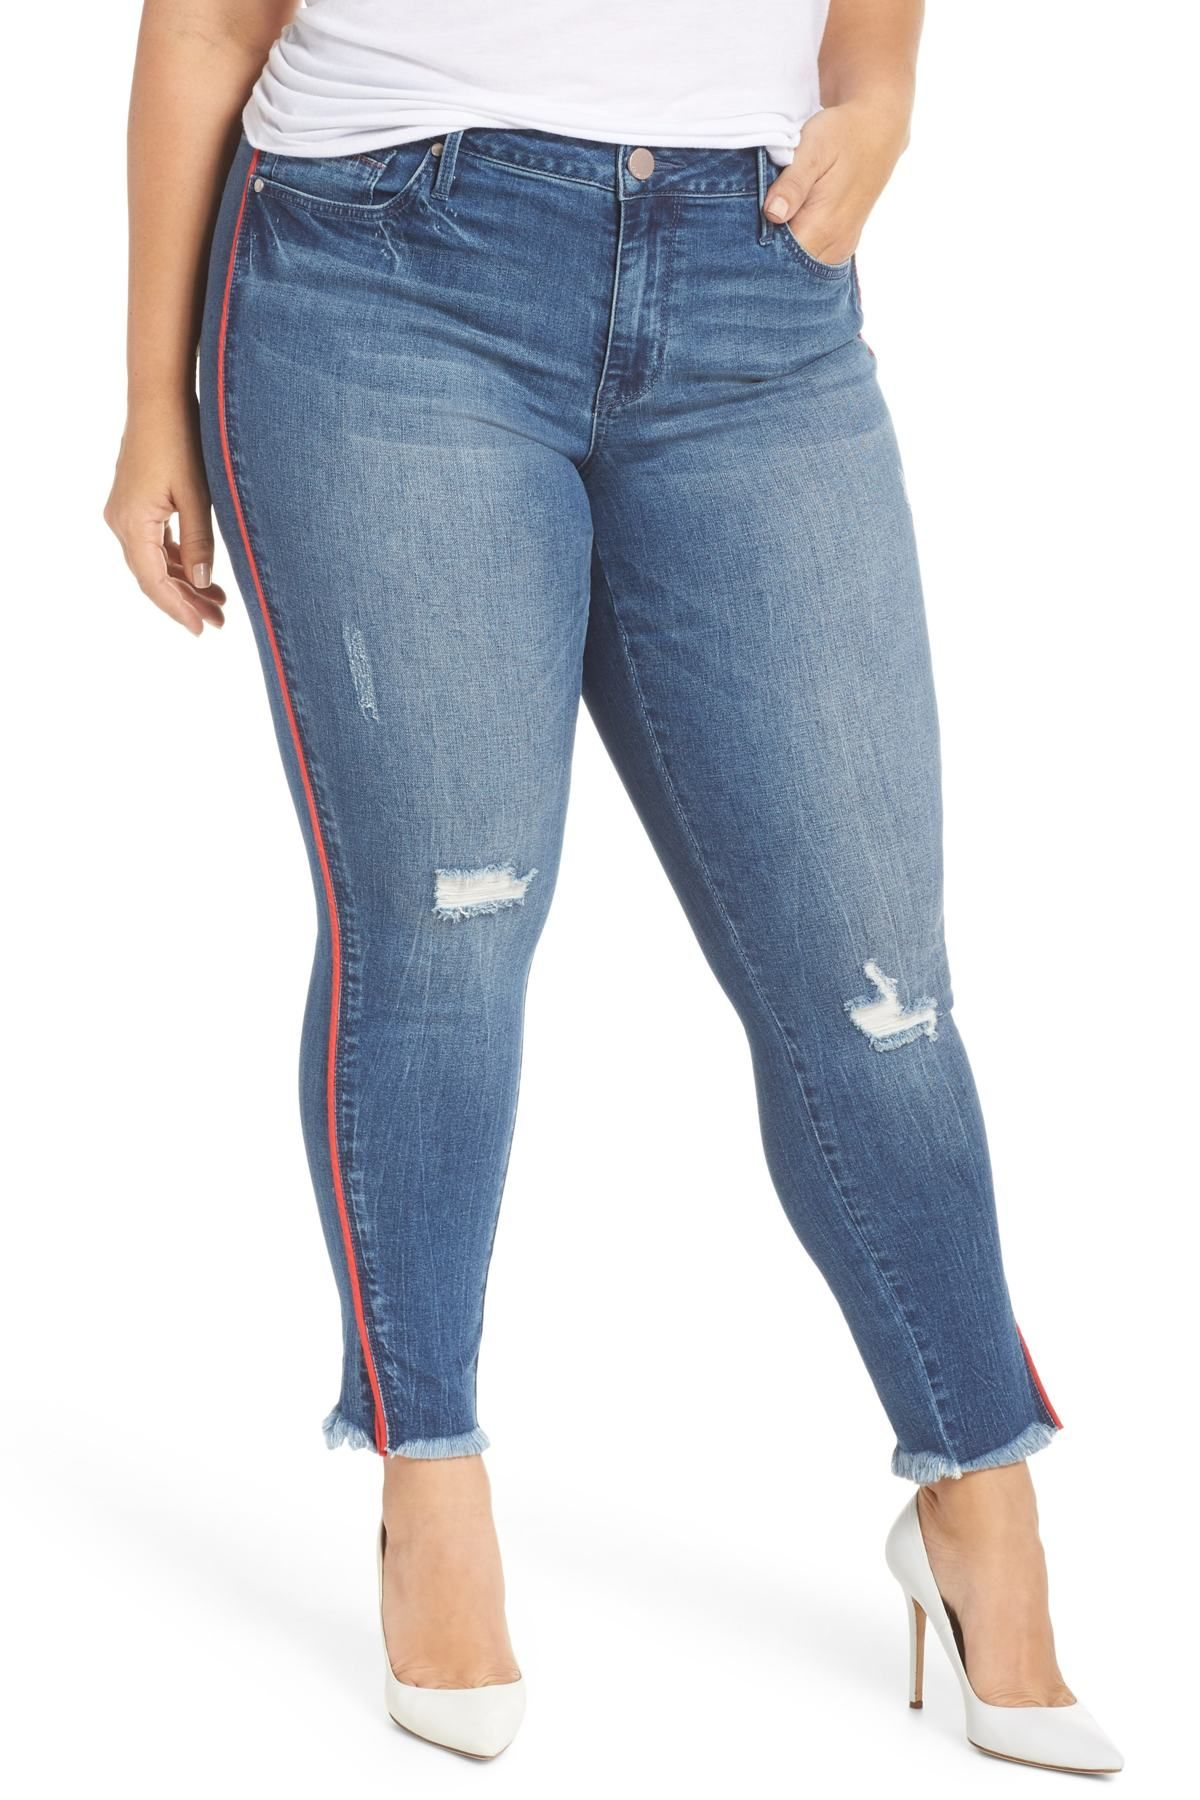 Seven7 | Fray Hem Ankle Skinny Jeans (Plus Size) | Nordstrom Rack #nordstromrack